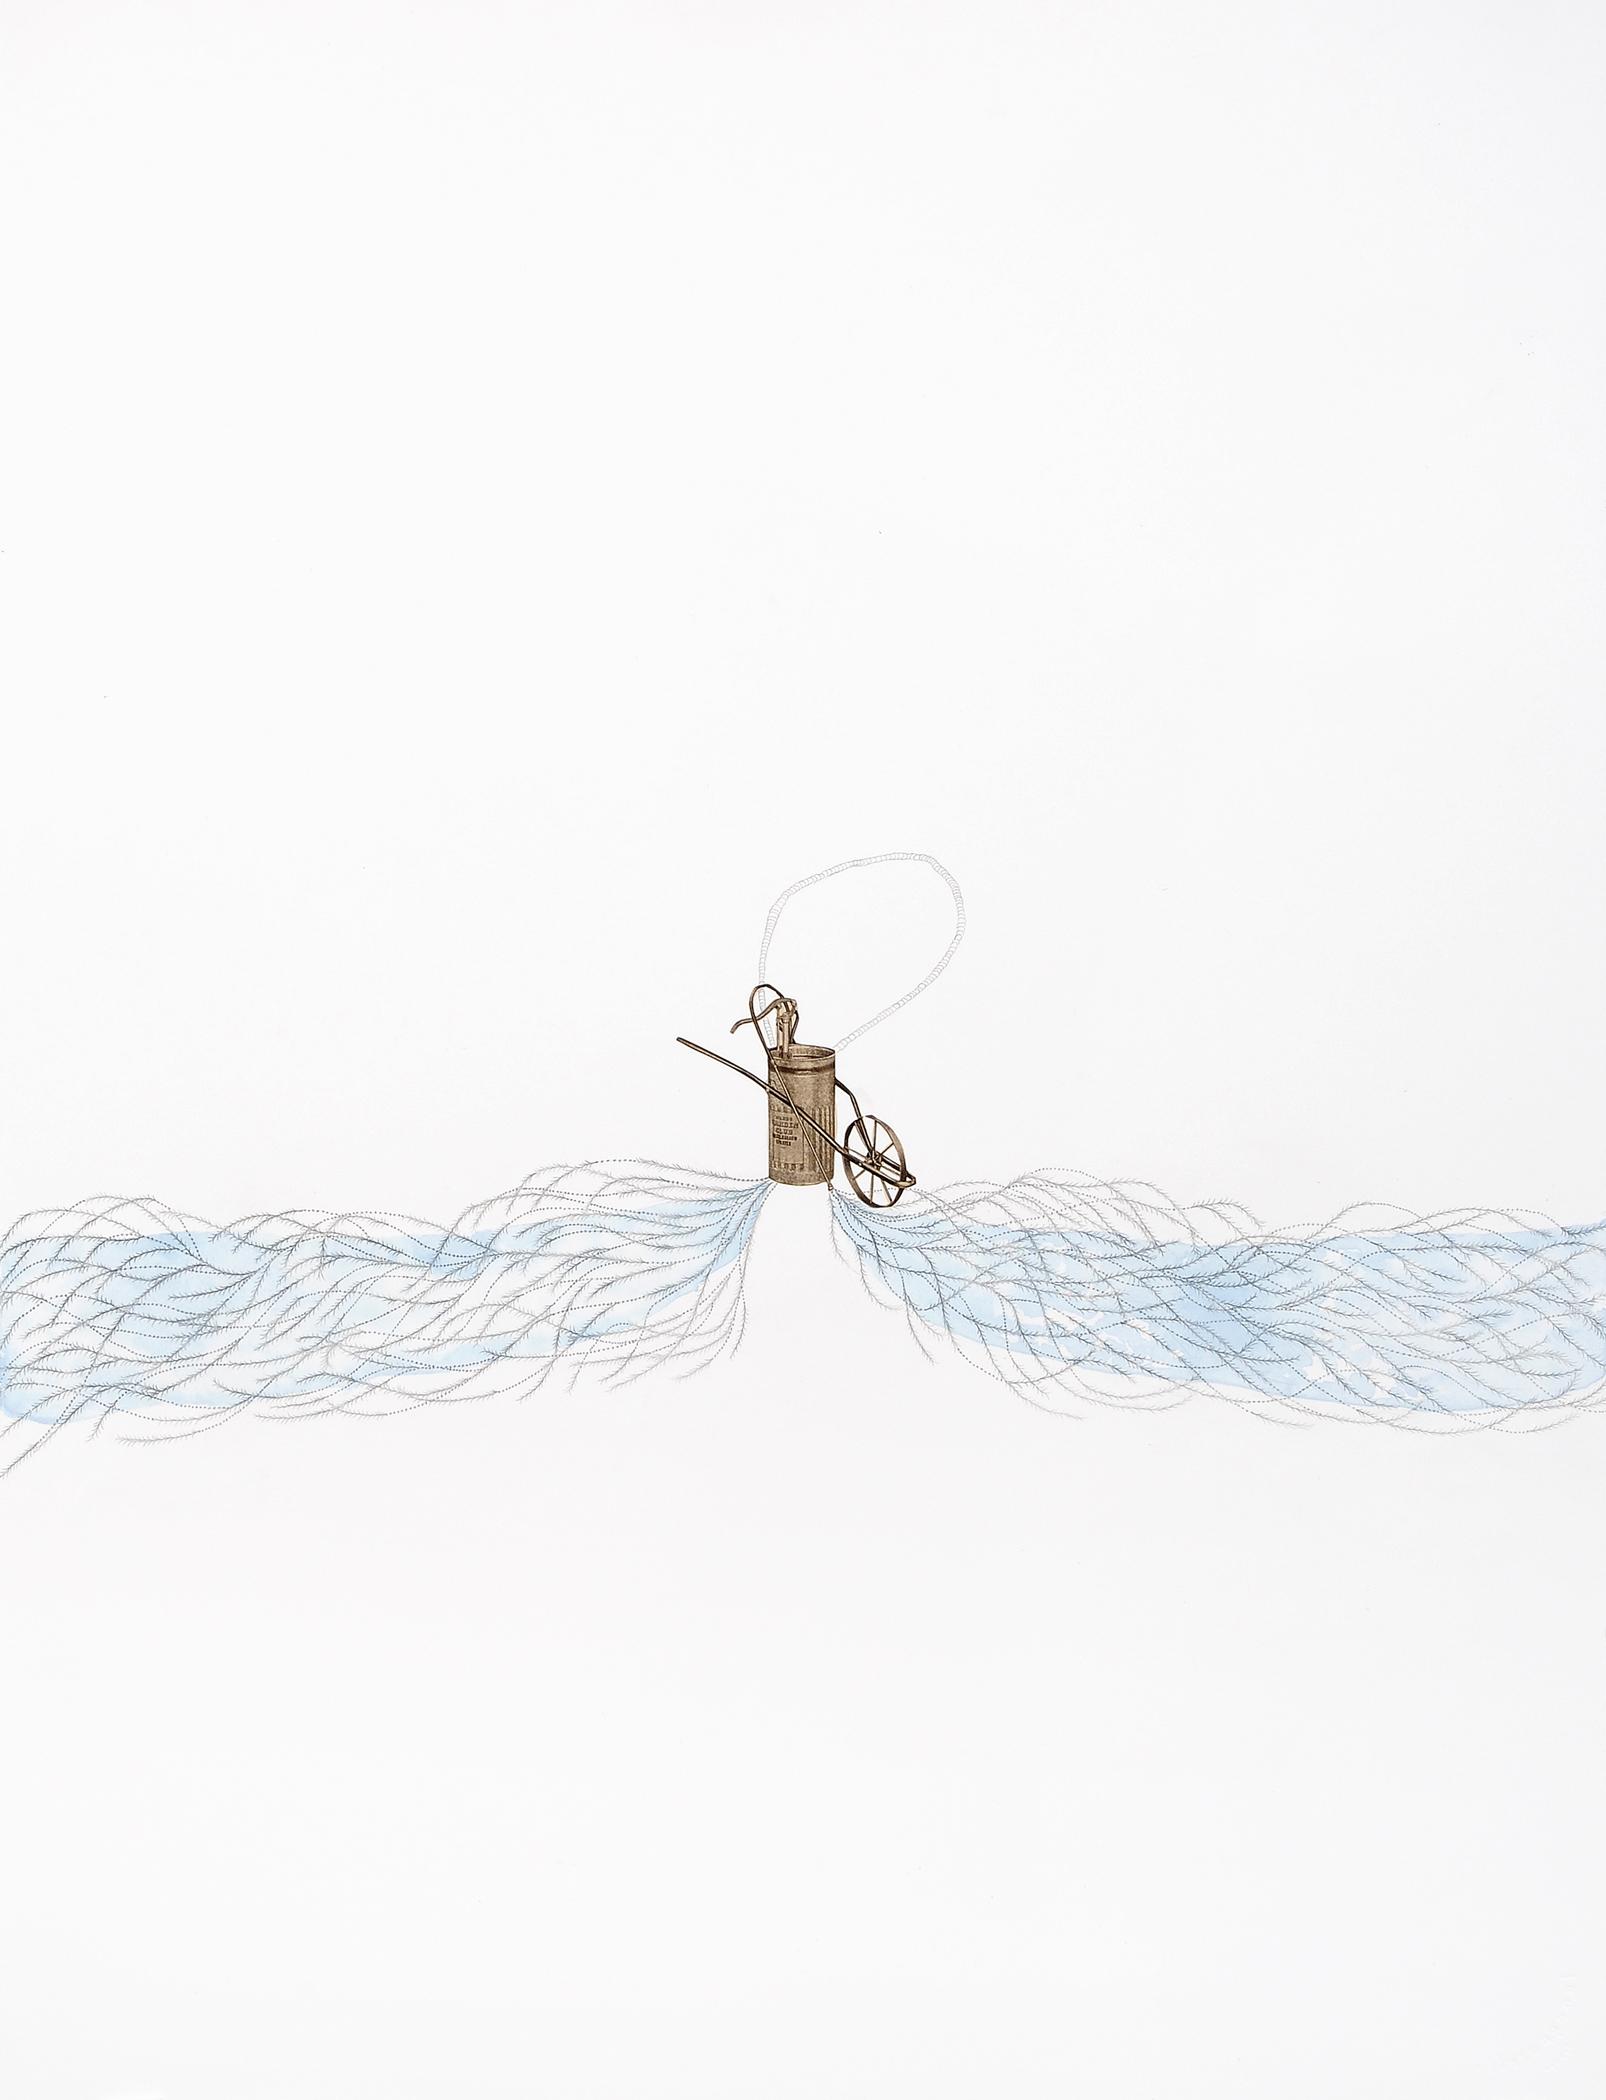 "Wheelbarrow Sprayer, gouache, graphite,collage on paper, 30"" x 22"", 2012"